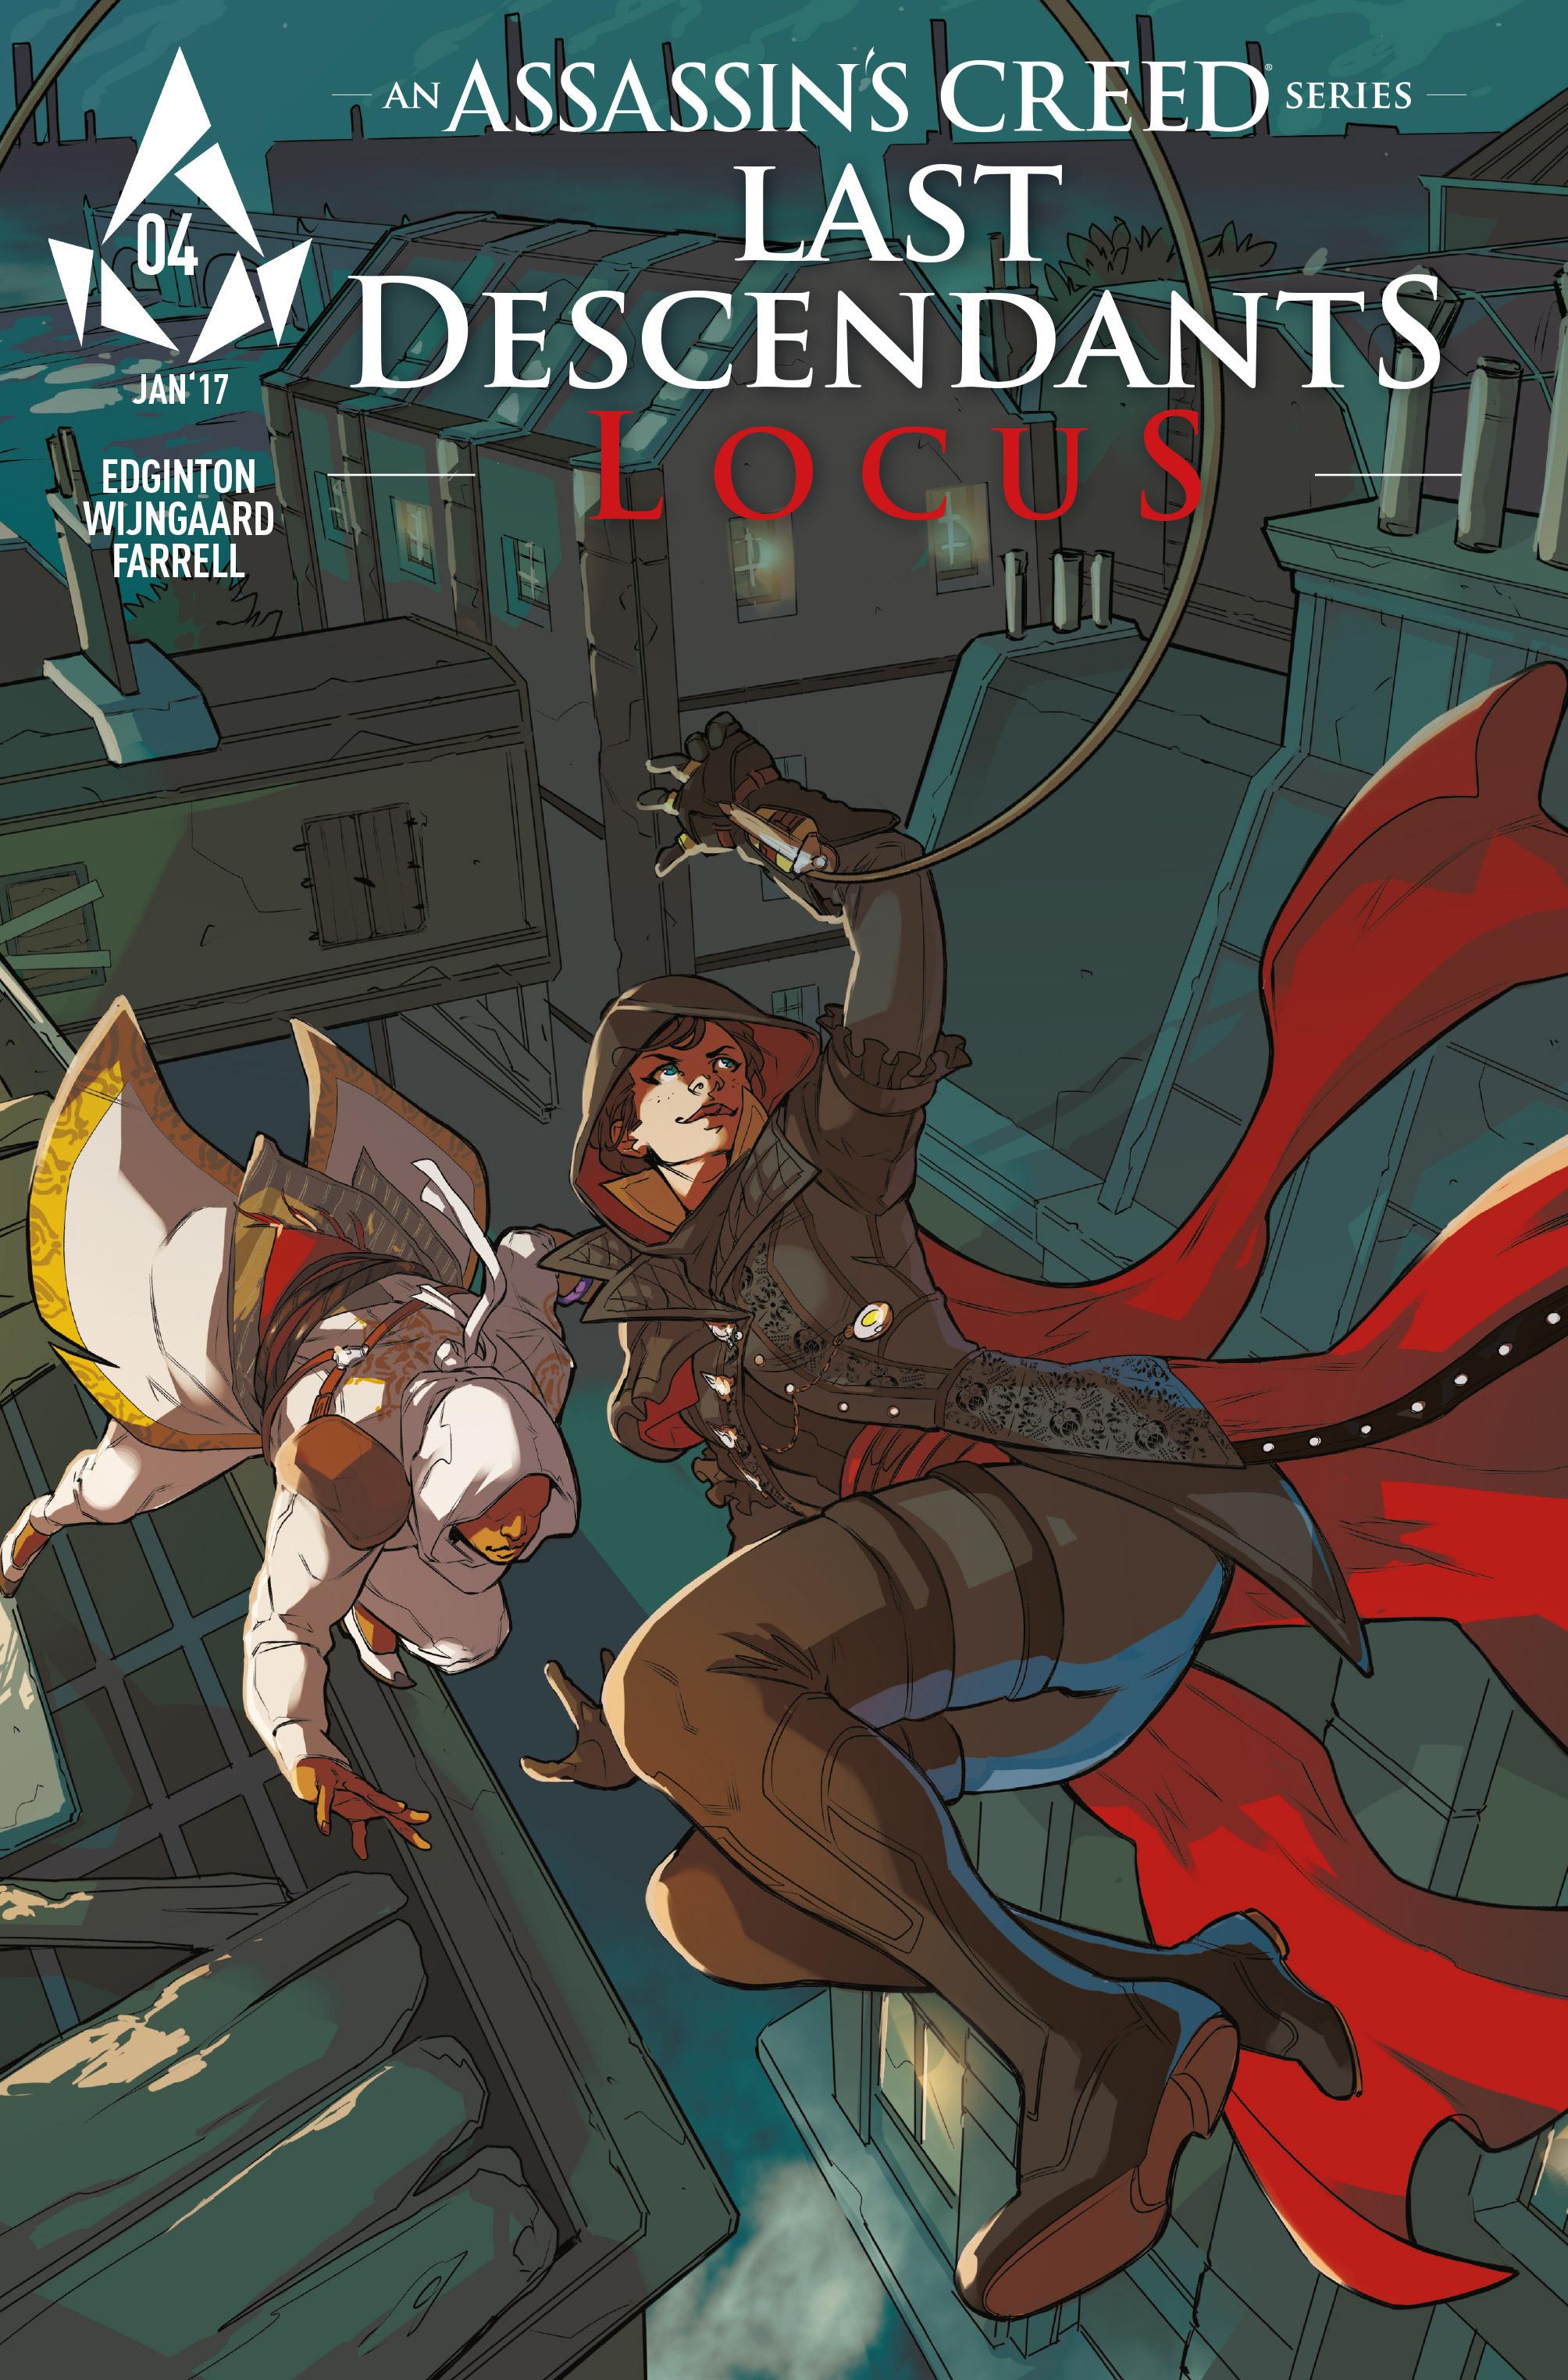 Read online Assassin's Creed: Locus comic -  Issue #4 - 2